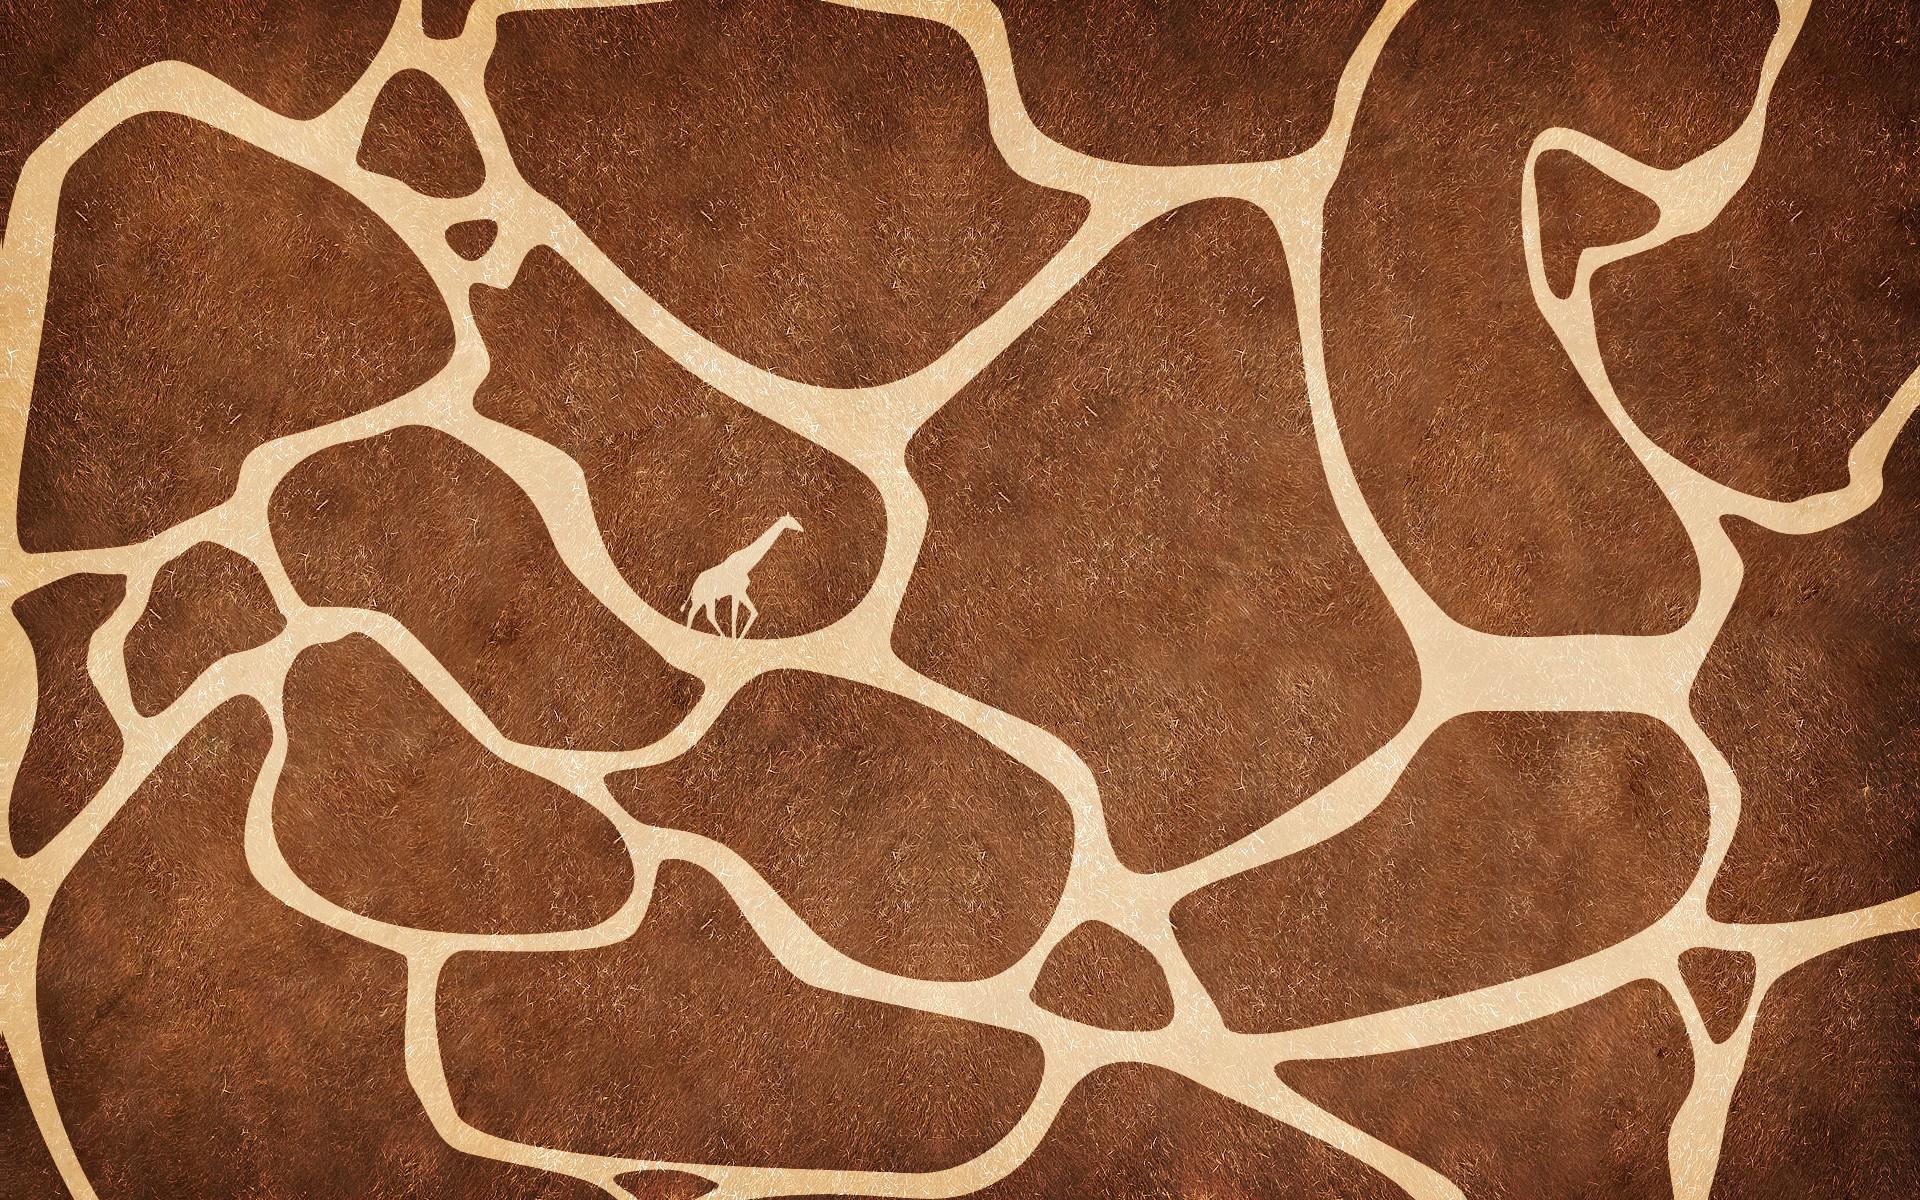 Amazing Wallpaper Colorful Giraffe - giraffe-pattern-11463-11840-hd-wallpapers  Trends_192374 .jpg